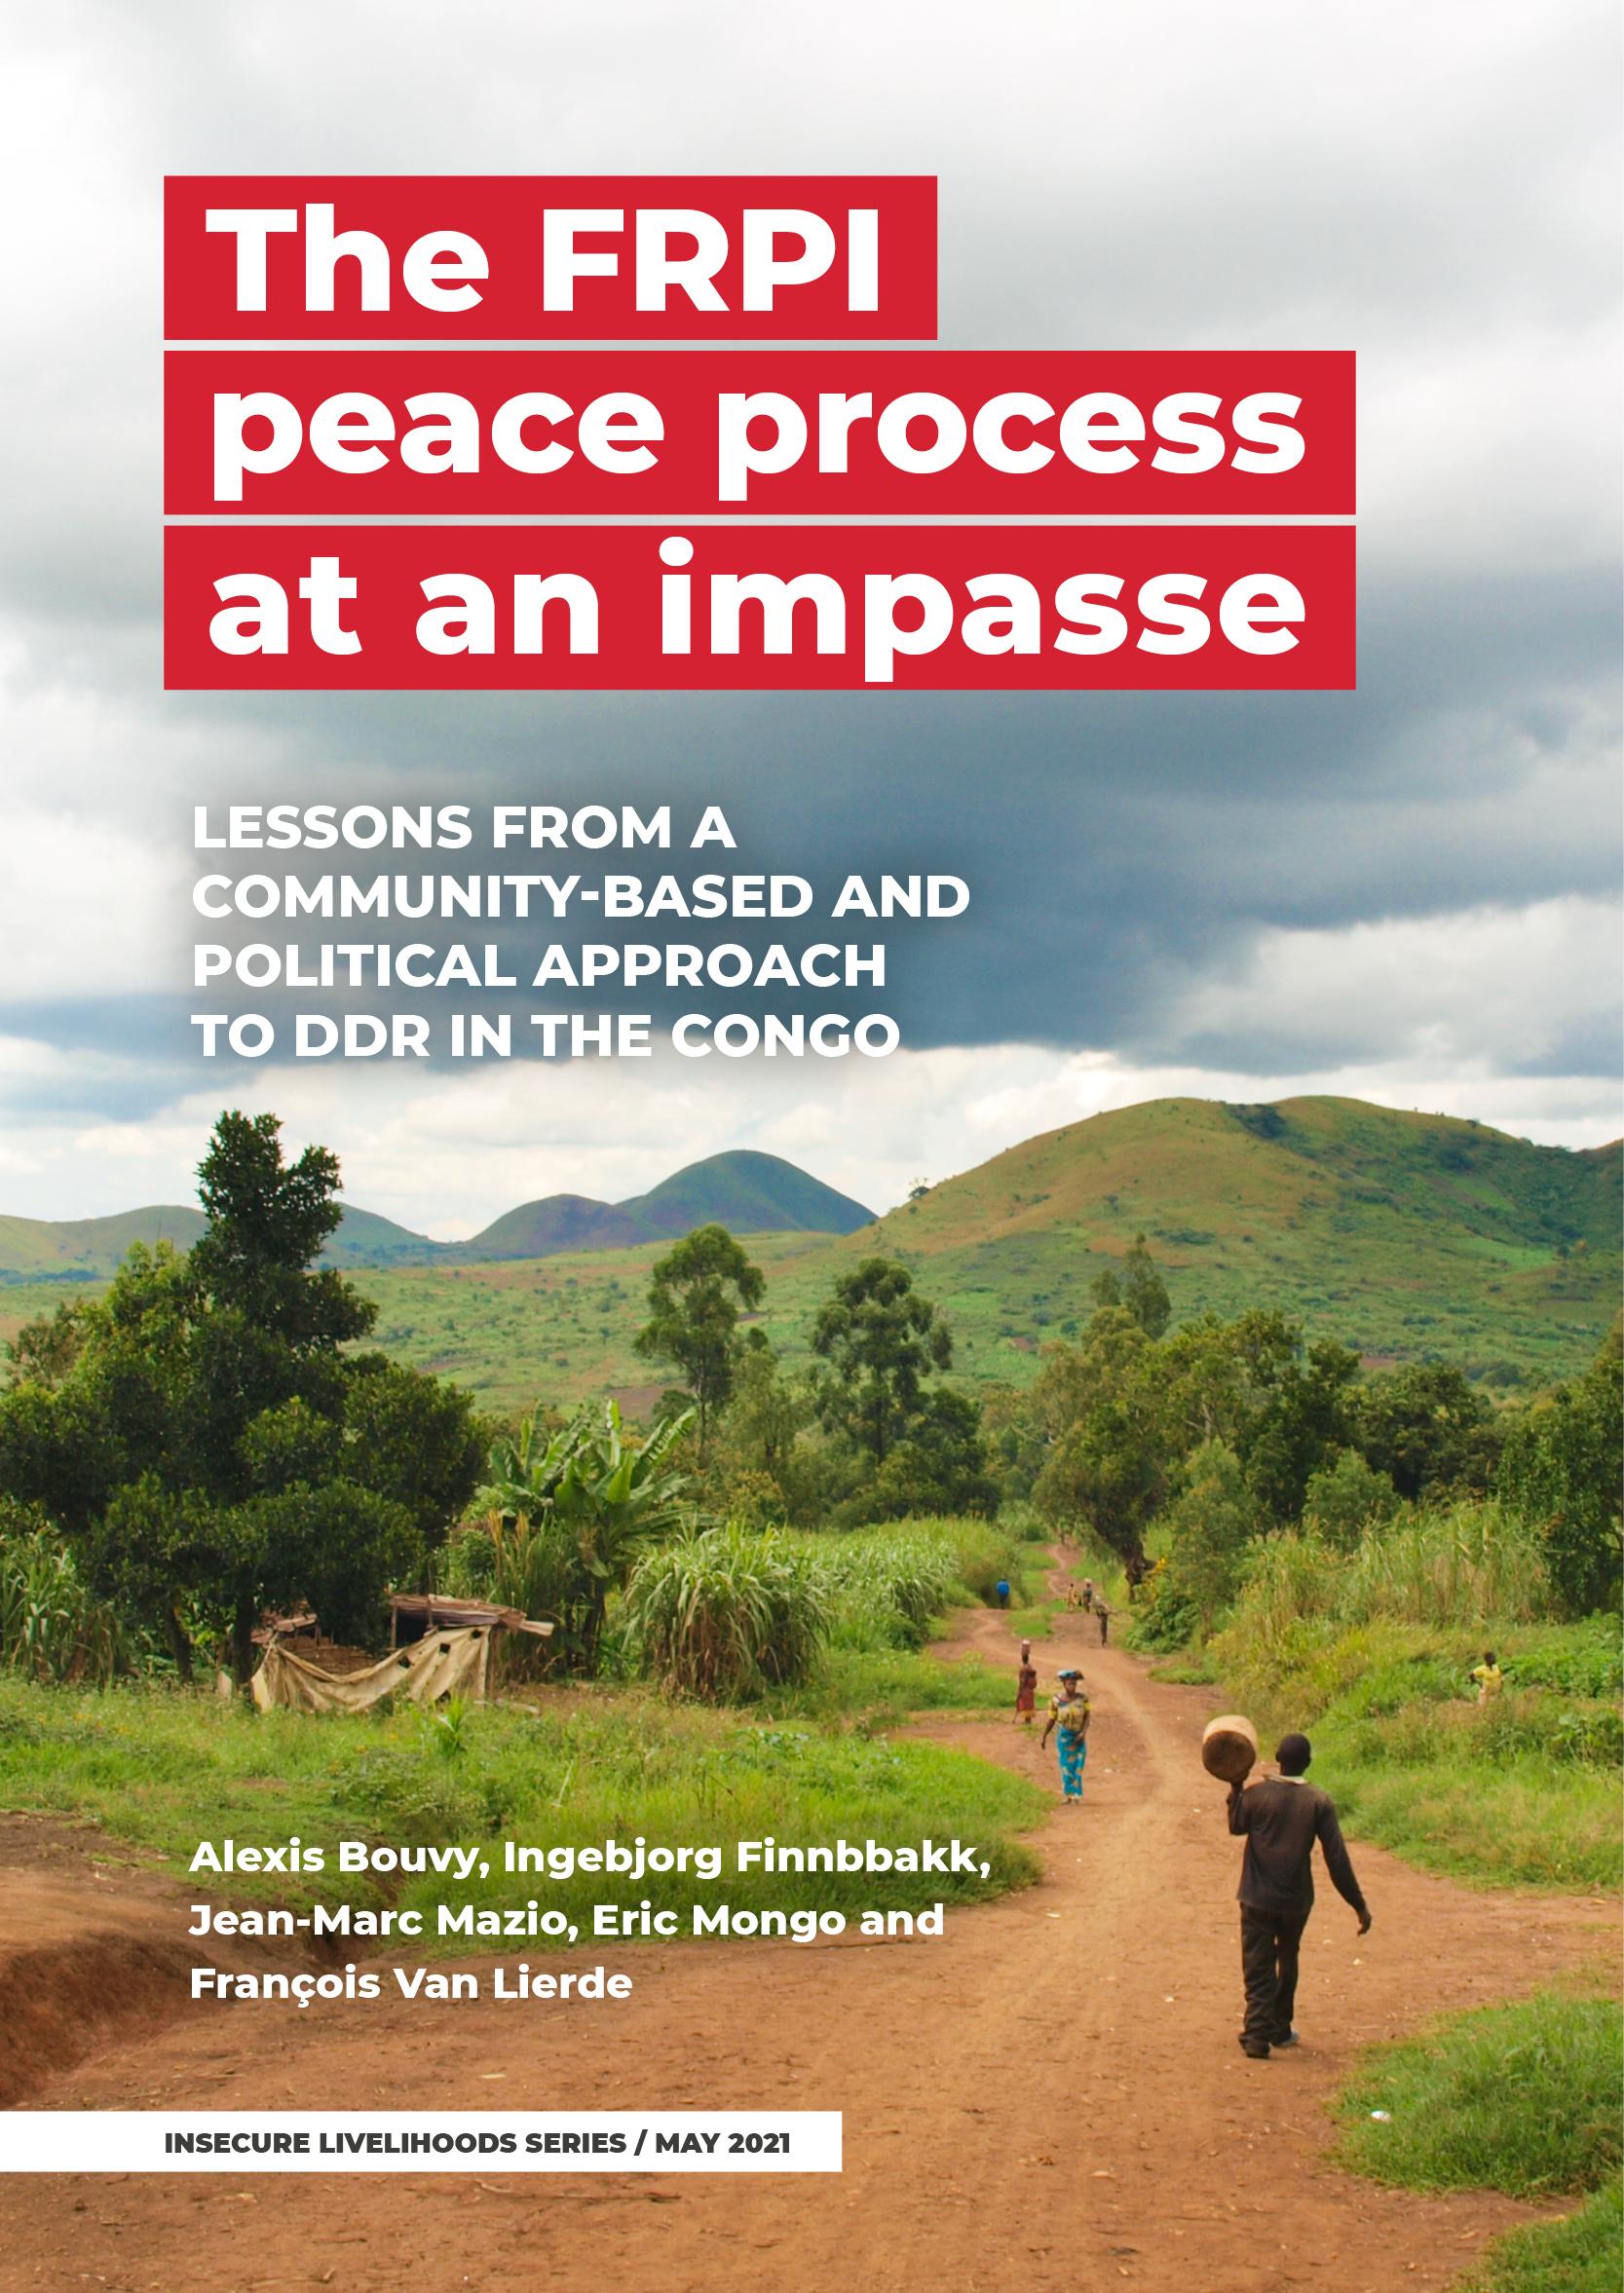 GIC_The FRPI peace process at an impasse_4